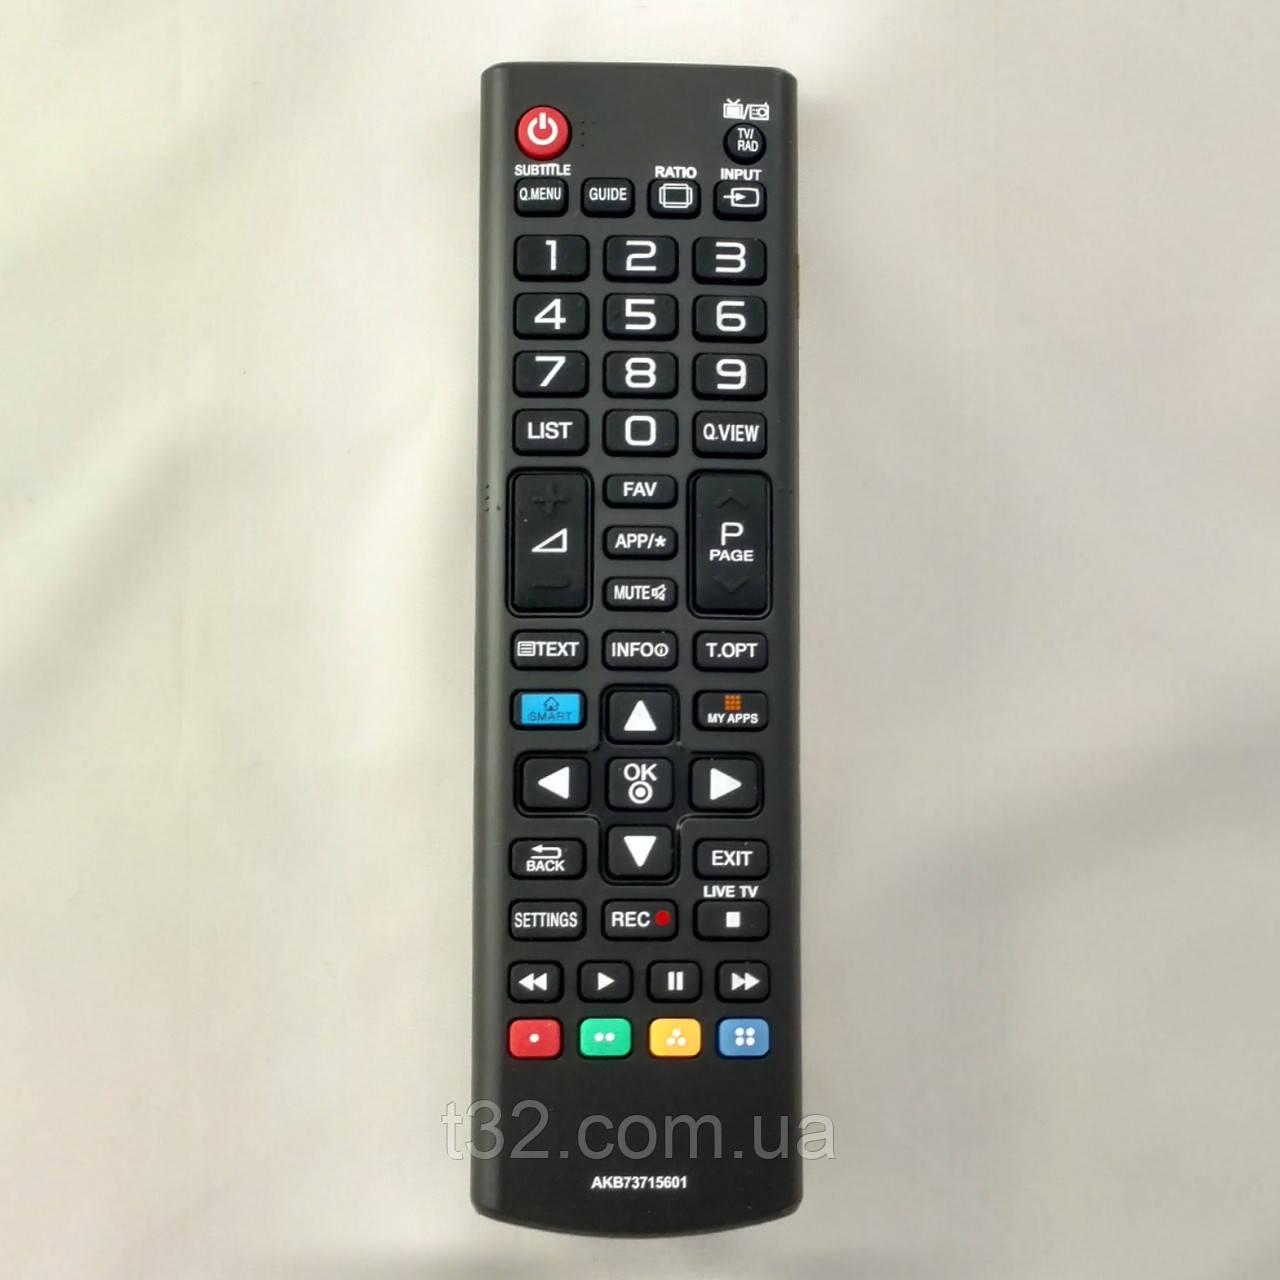 Пульт LG Smart TV AKB73715601 [TV] [09/185]